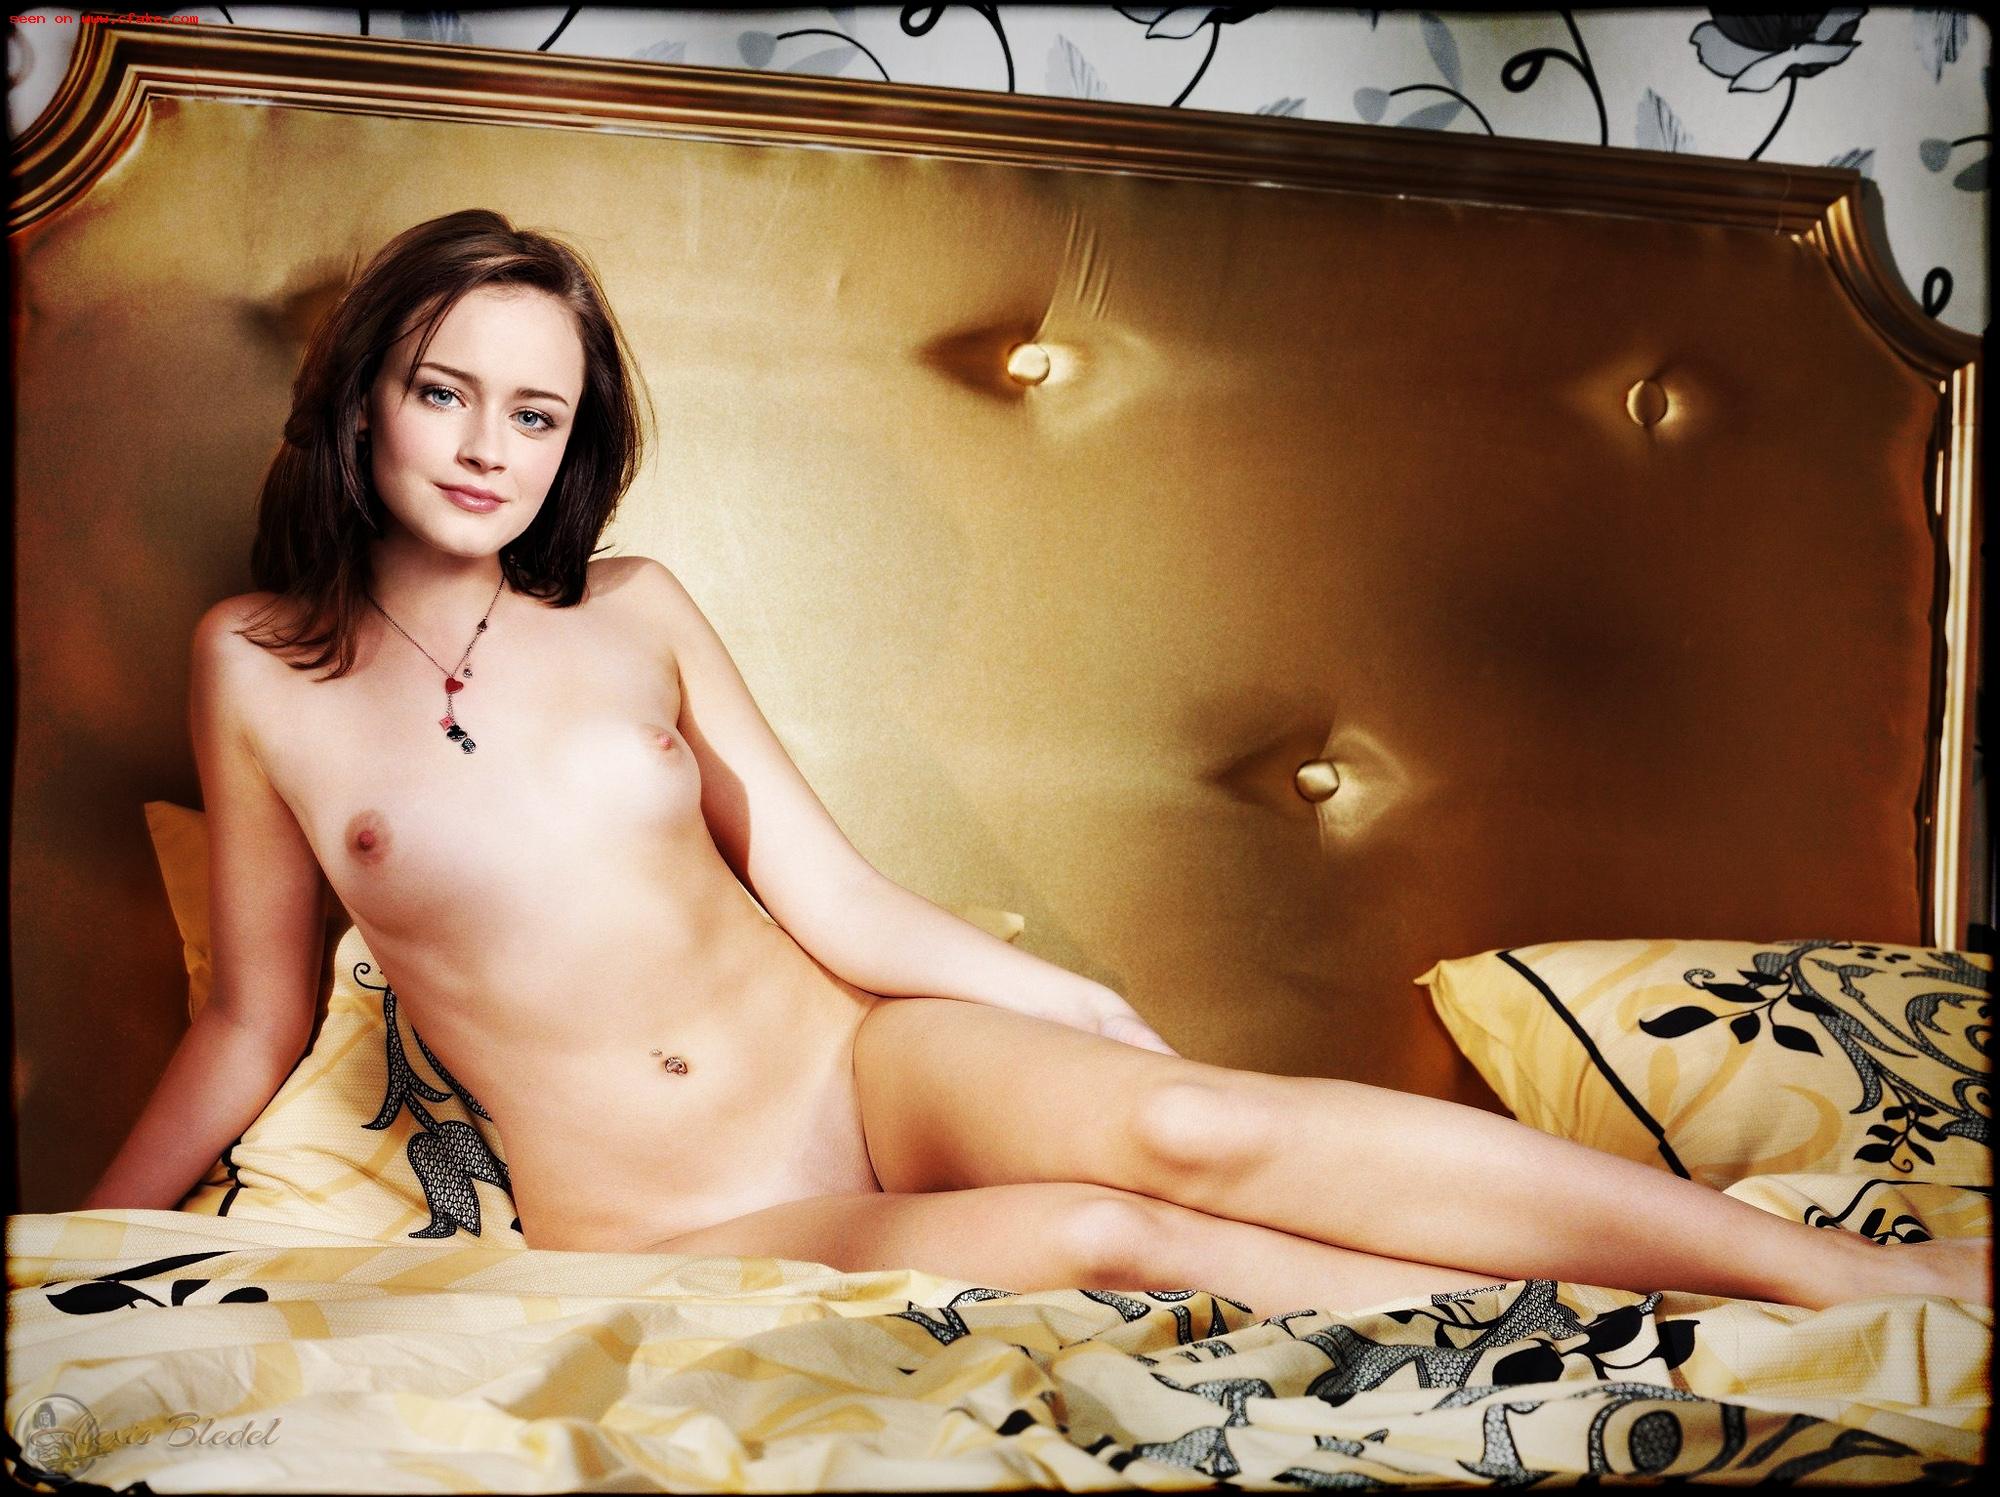 Alexis bledel wallpapers, celebrity, hq alexis bledel pictures